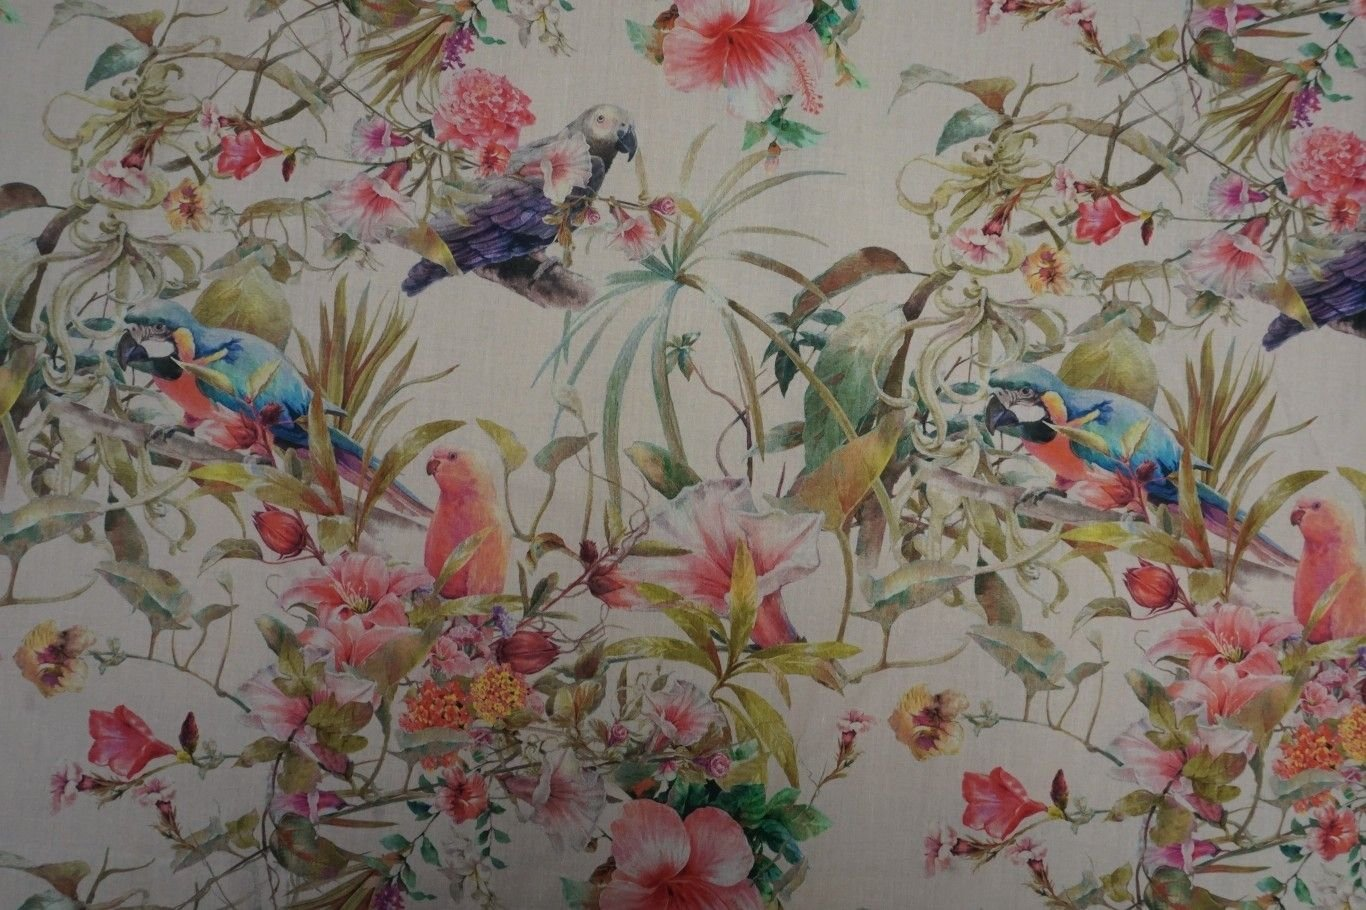 Lady McElroy Cotton Lawn - Parrotdise